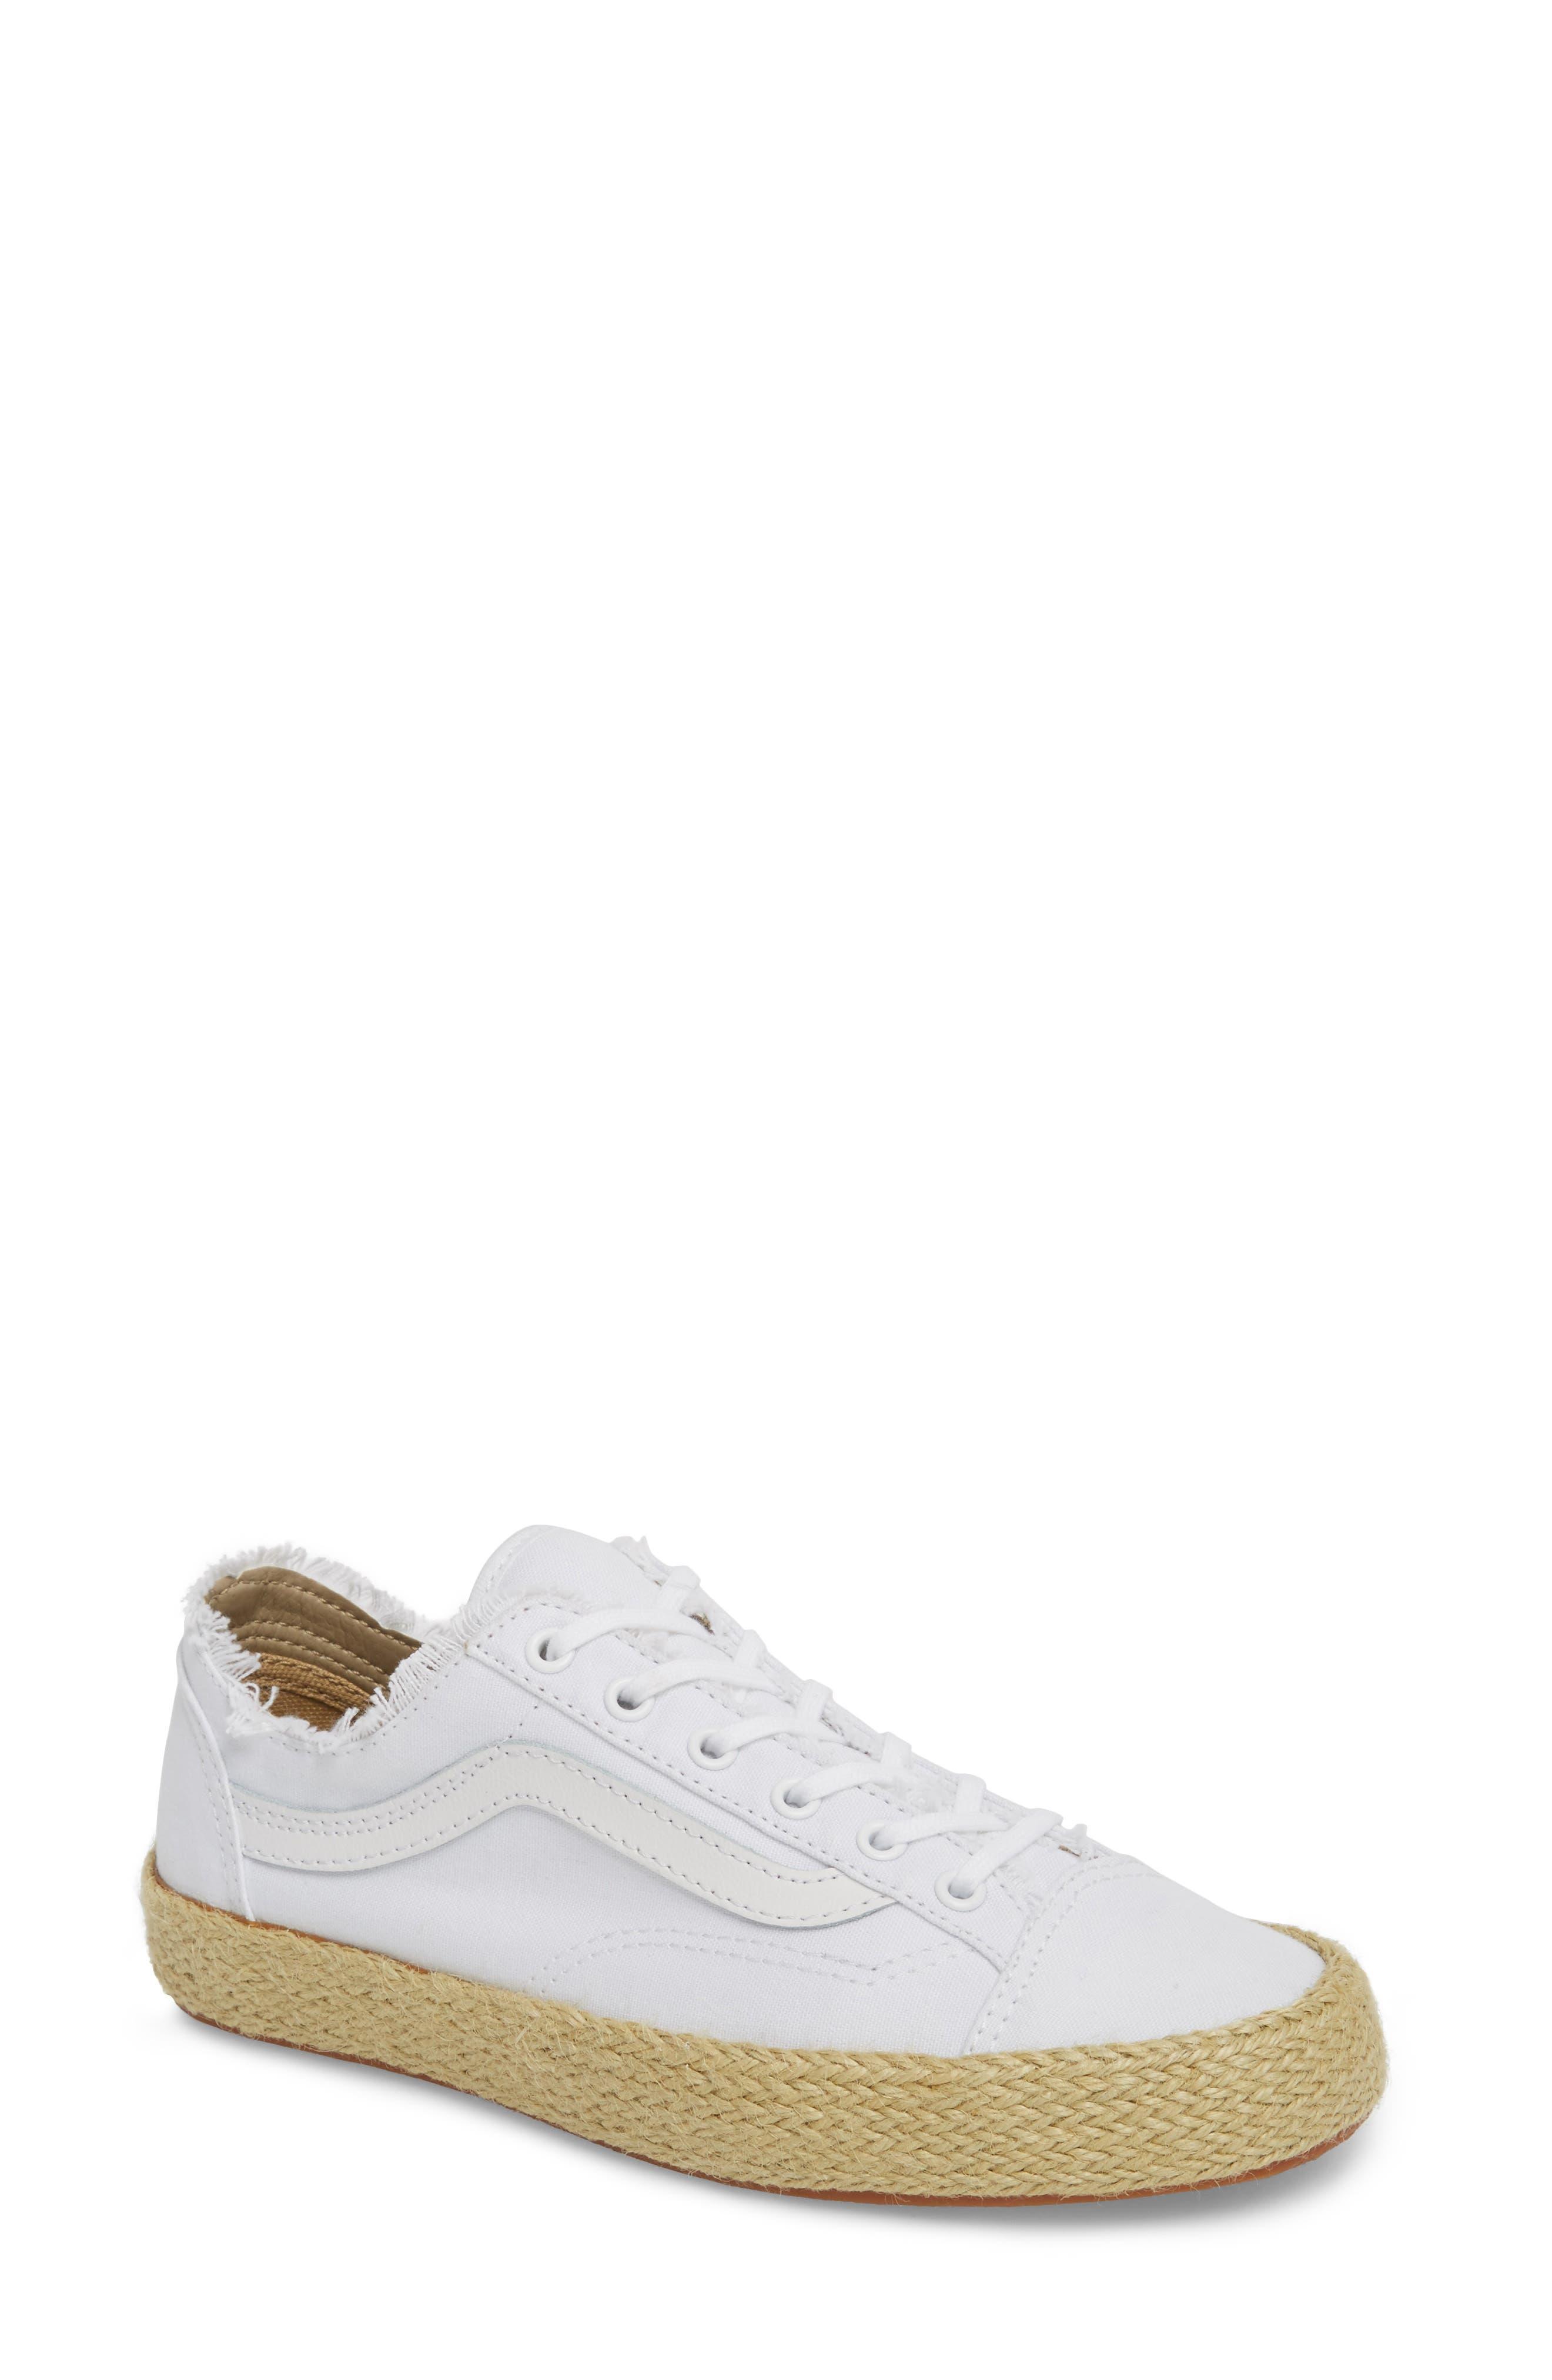 Style 36 Decon Sneaker,                             Main thumbnail 1, color,